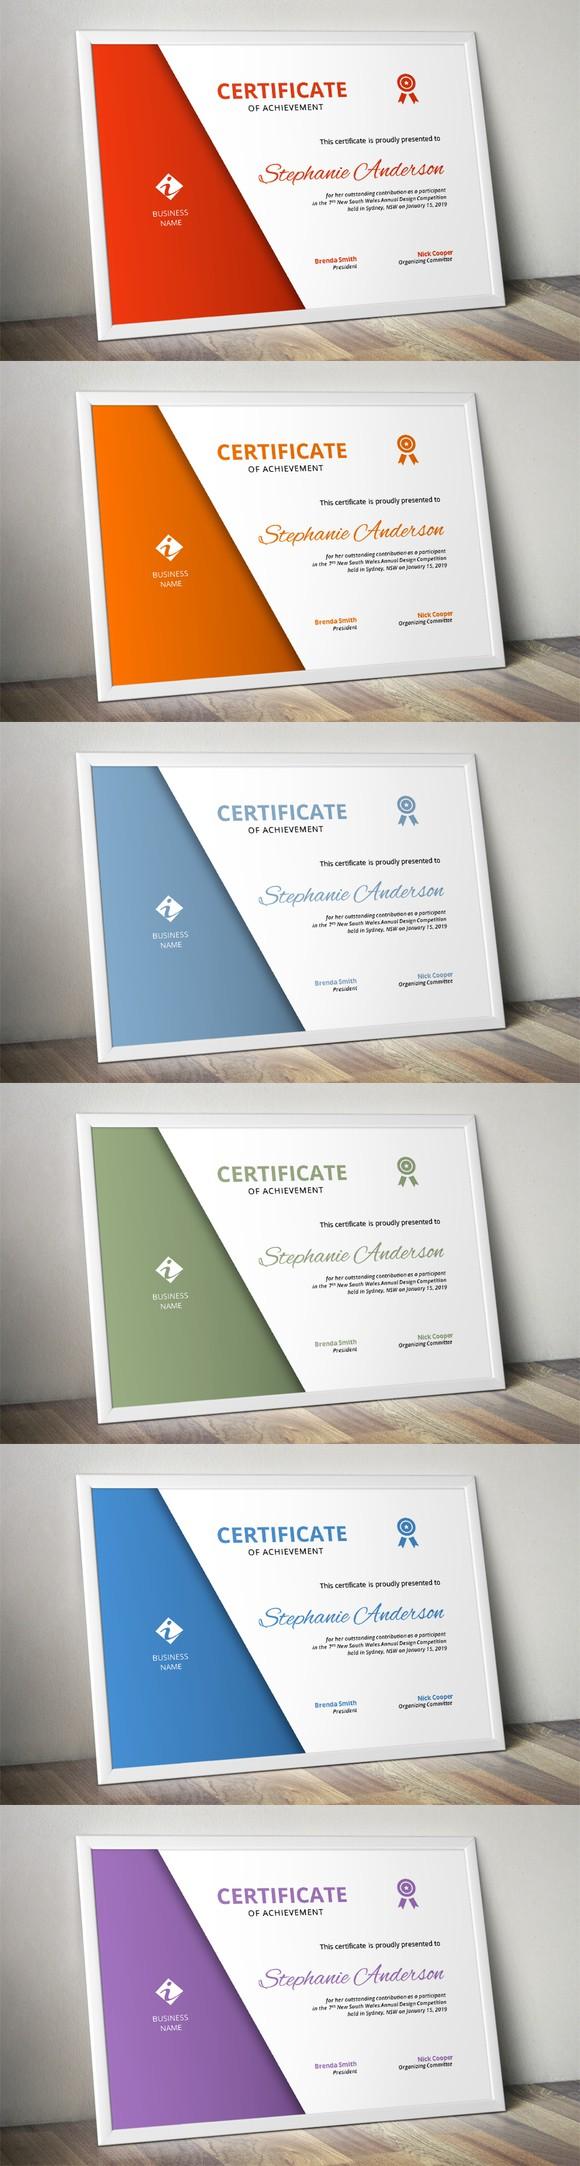 simple corporate certificate printables 6 00 certificate